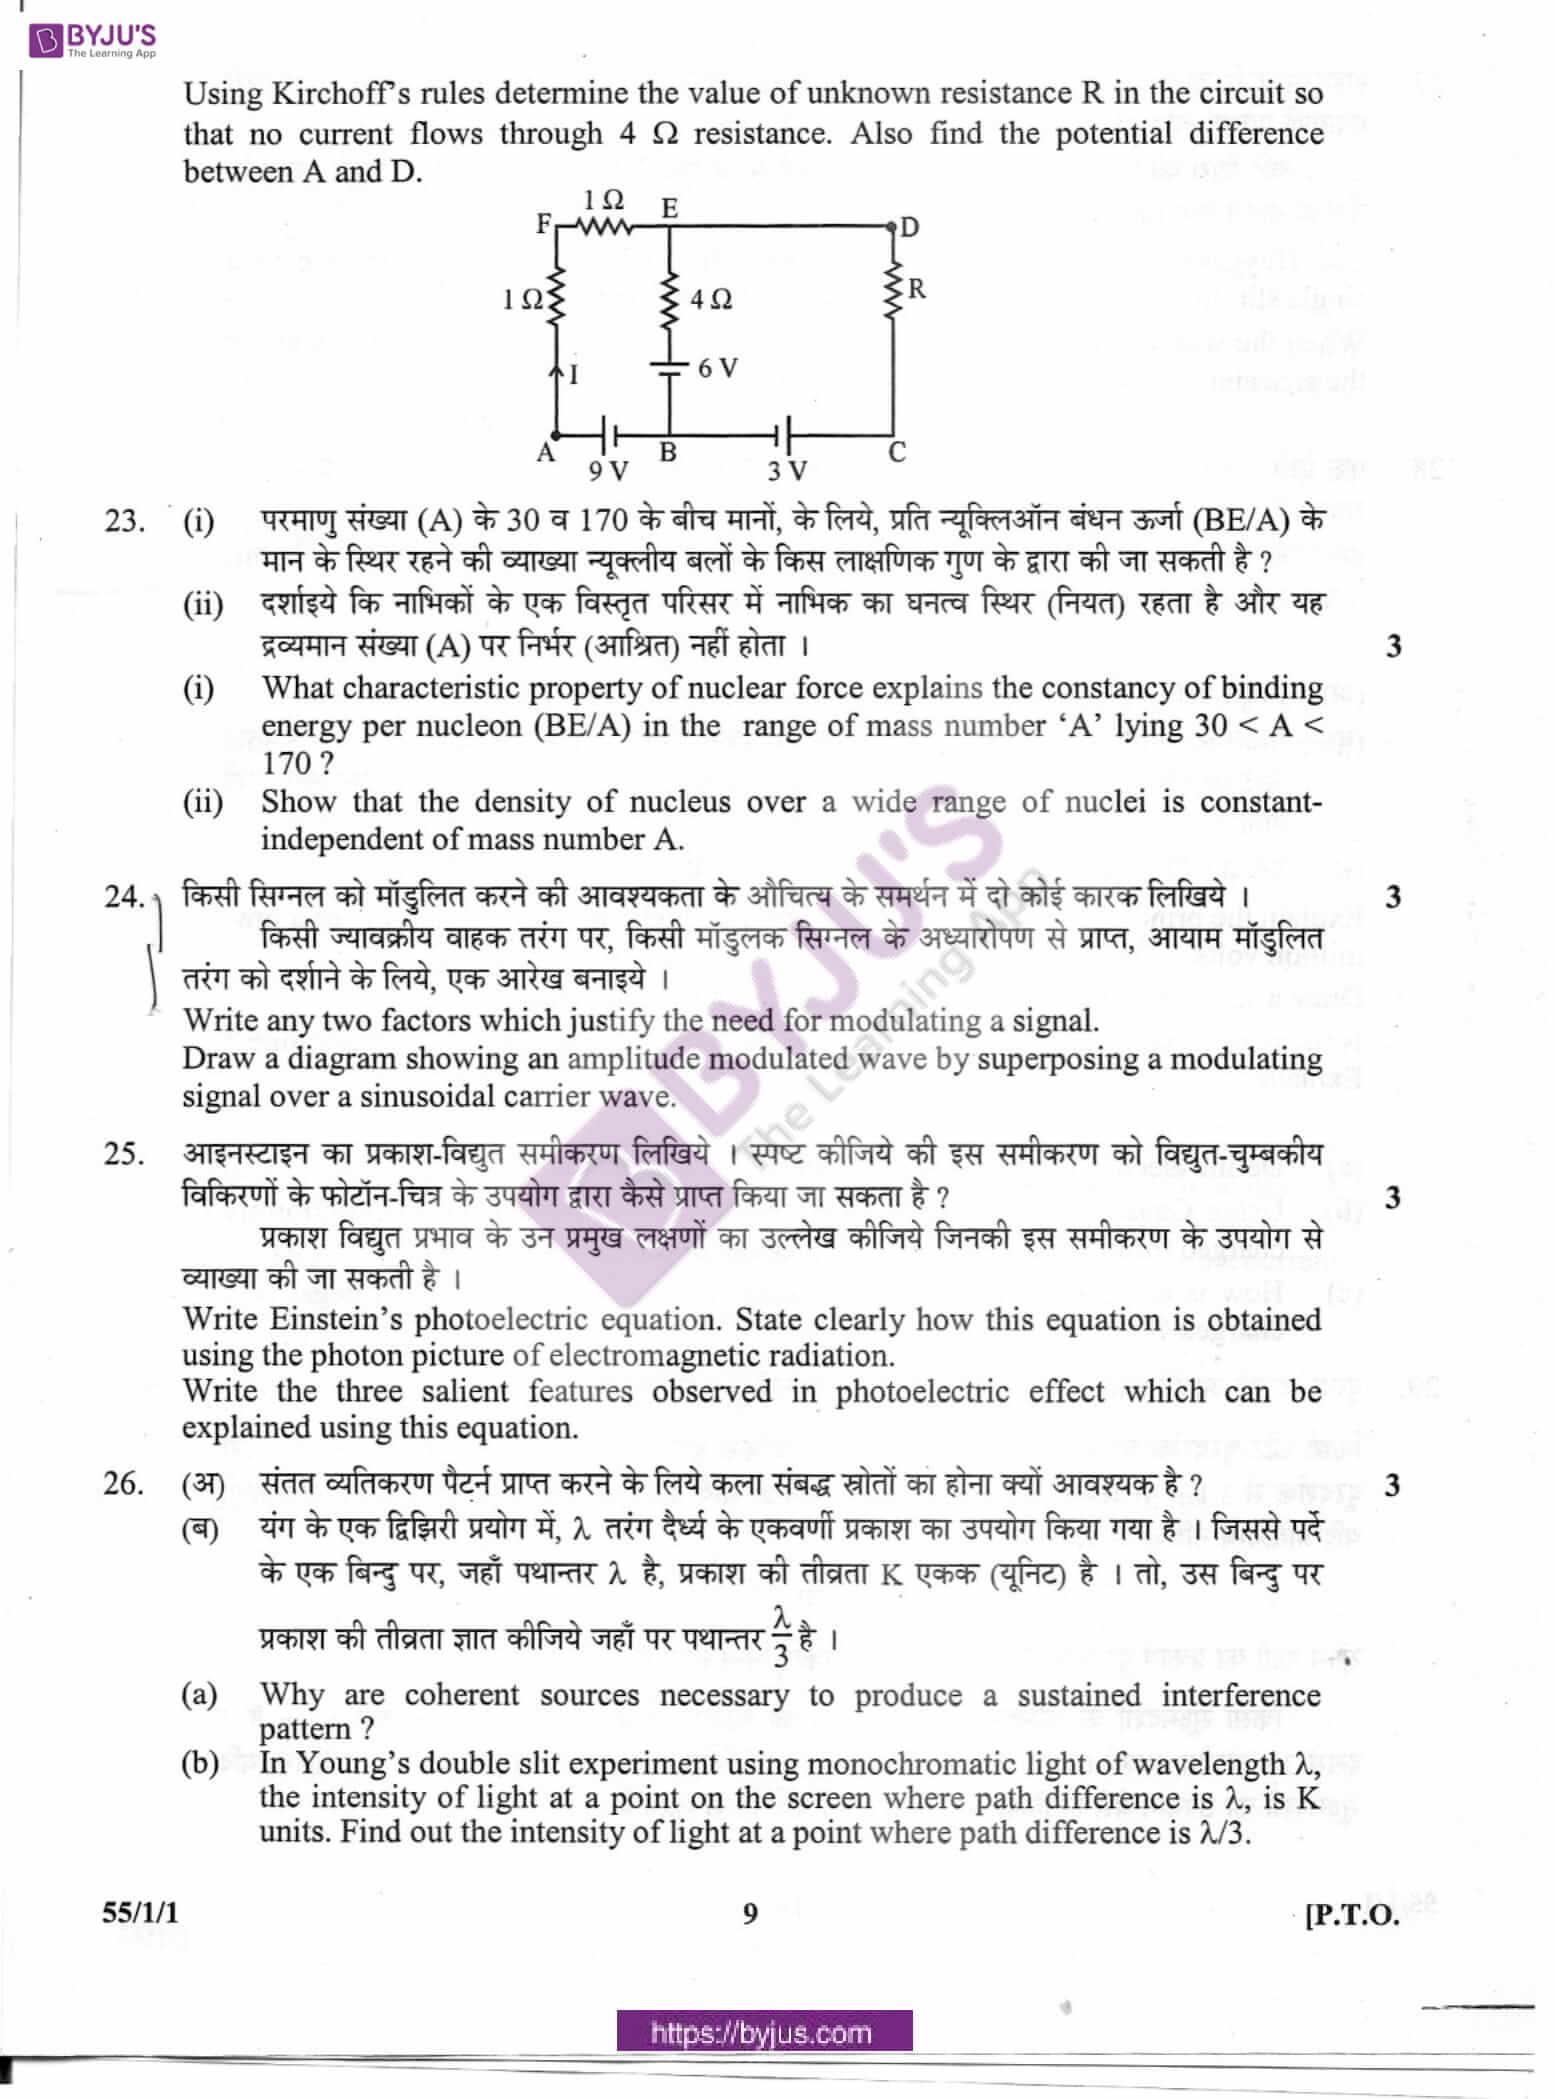 cbse class 12 physics question paper 2012 set 1